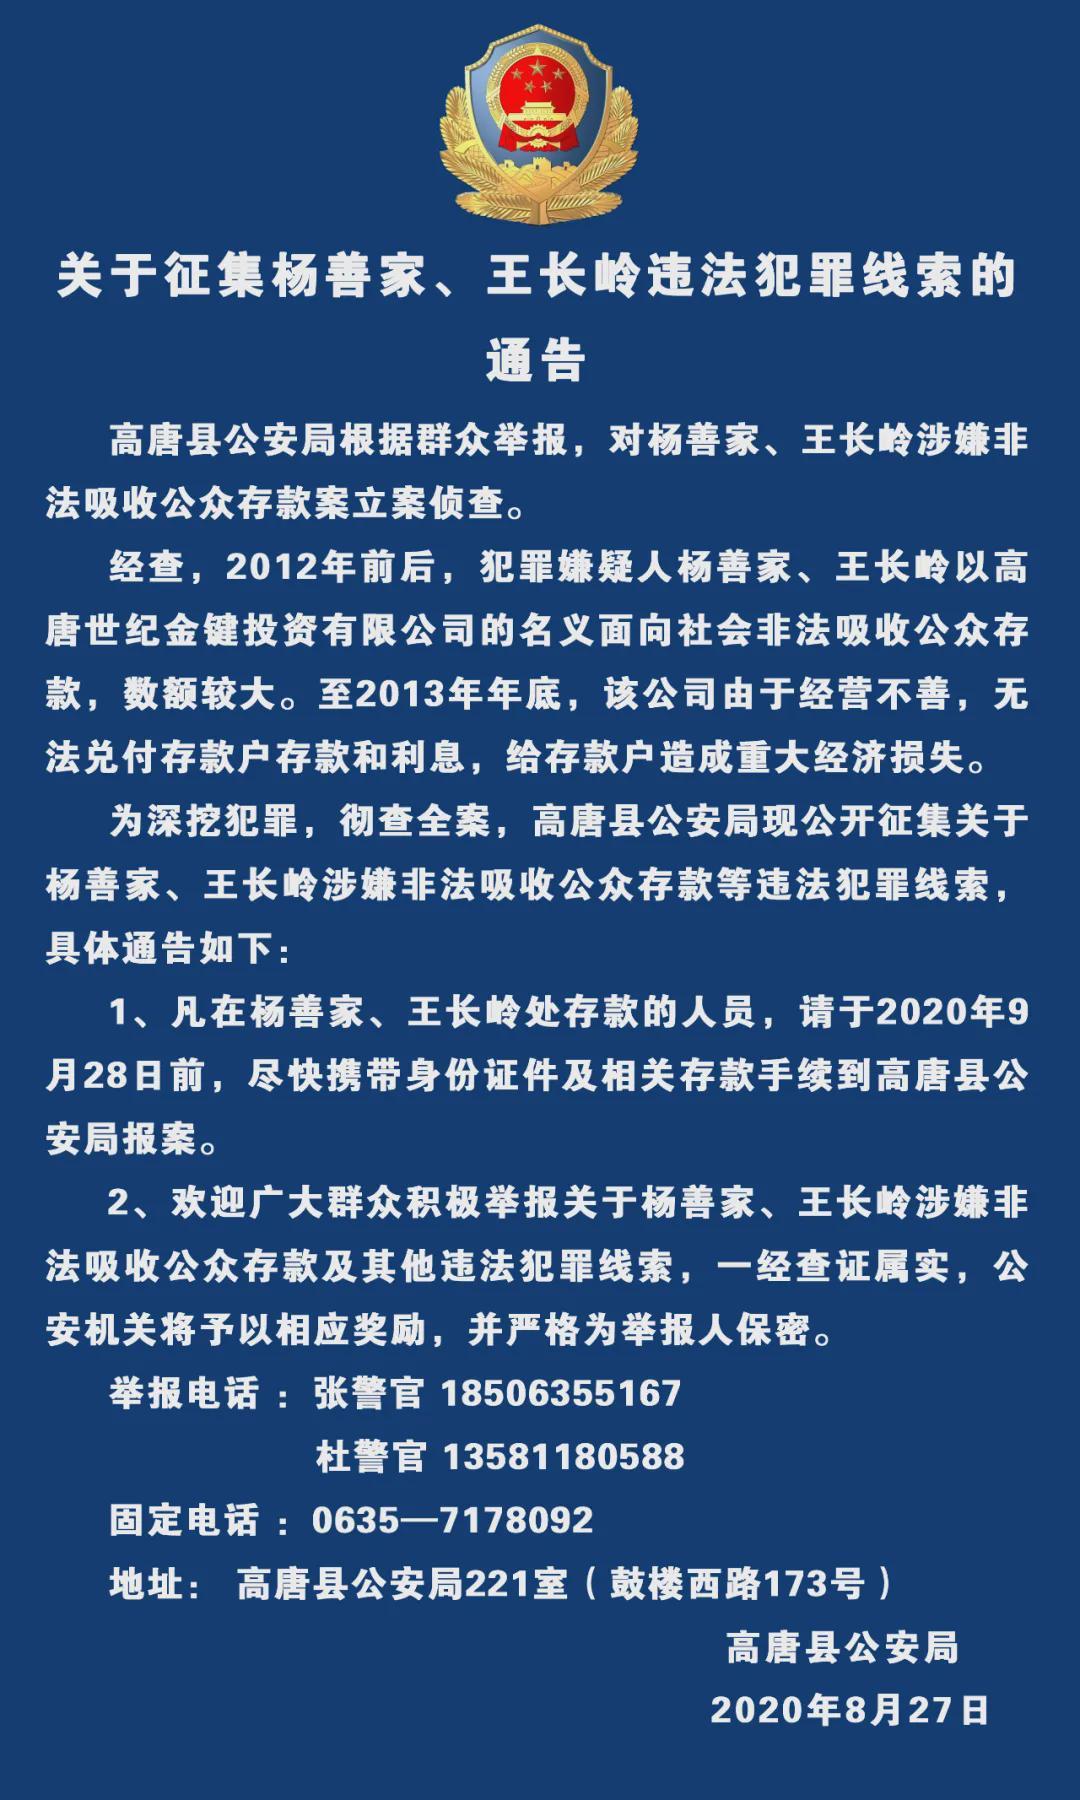 <strong>《关于收集杨、王长龄犯罪线索的通知》</strong>